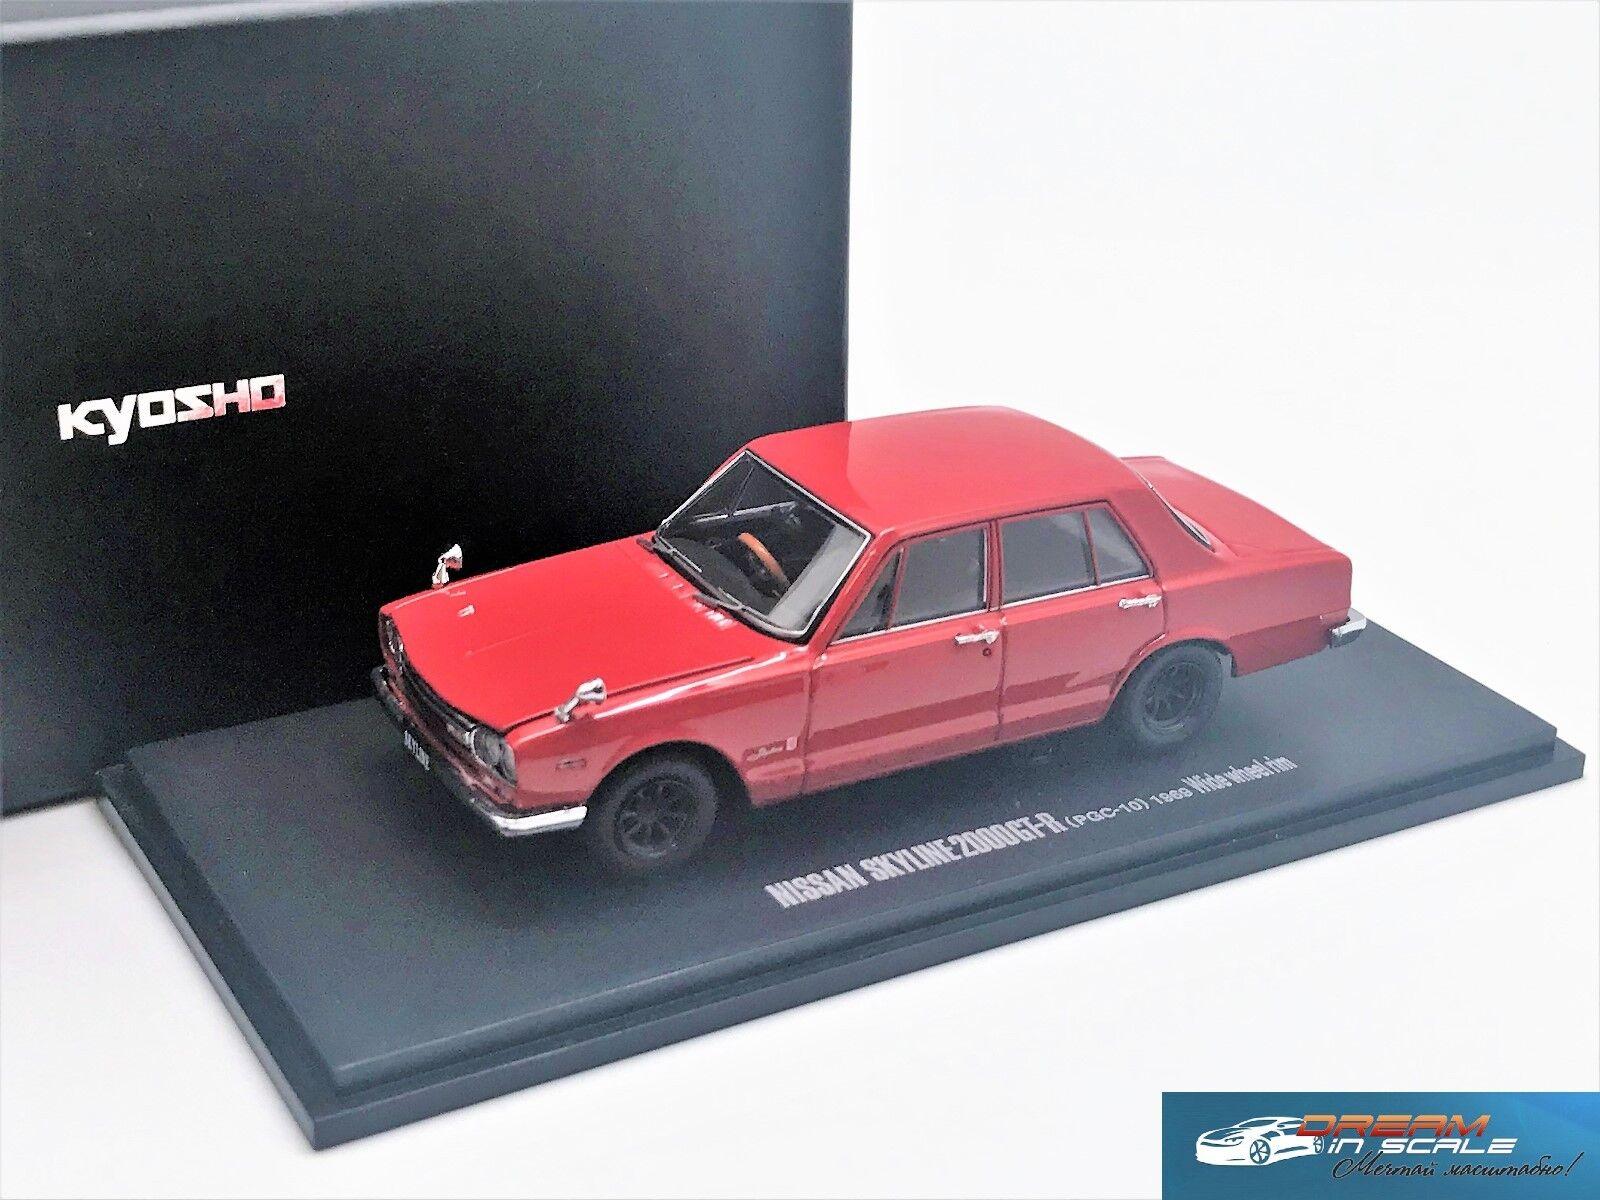 Nissan Skyline 2000GT-R PGC10 1969 KYOSHO 05511R 1 43